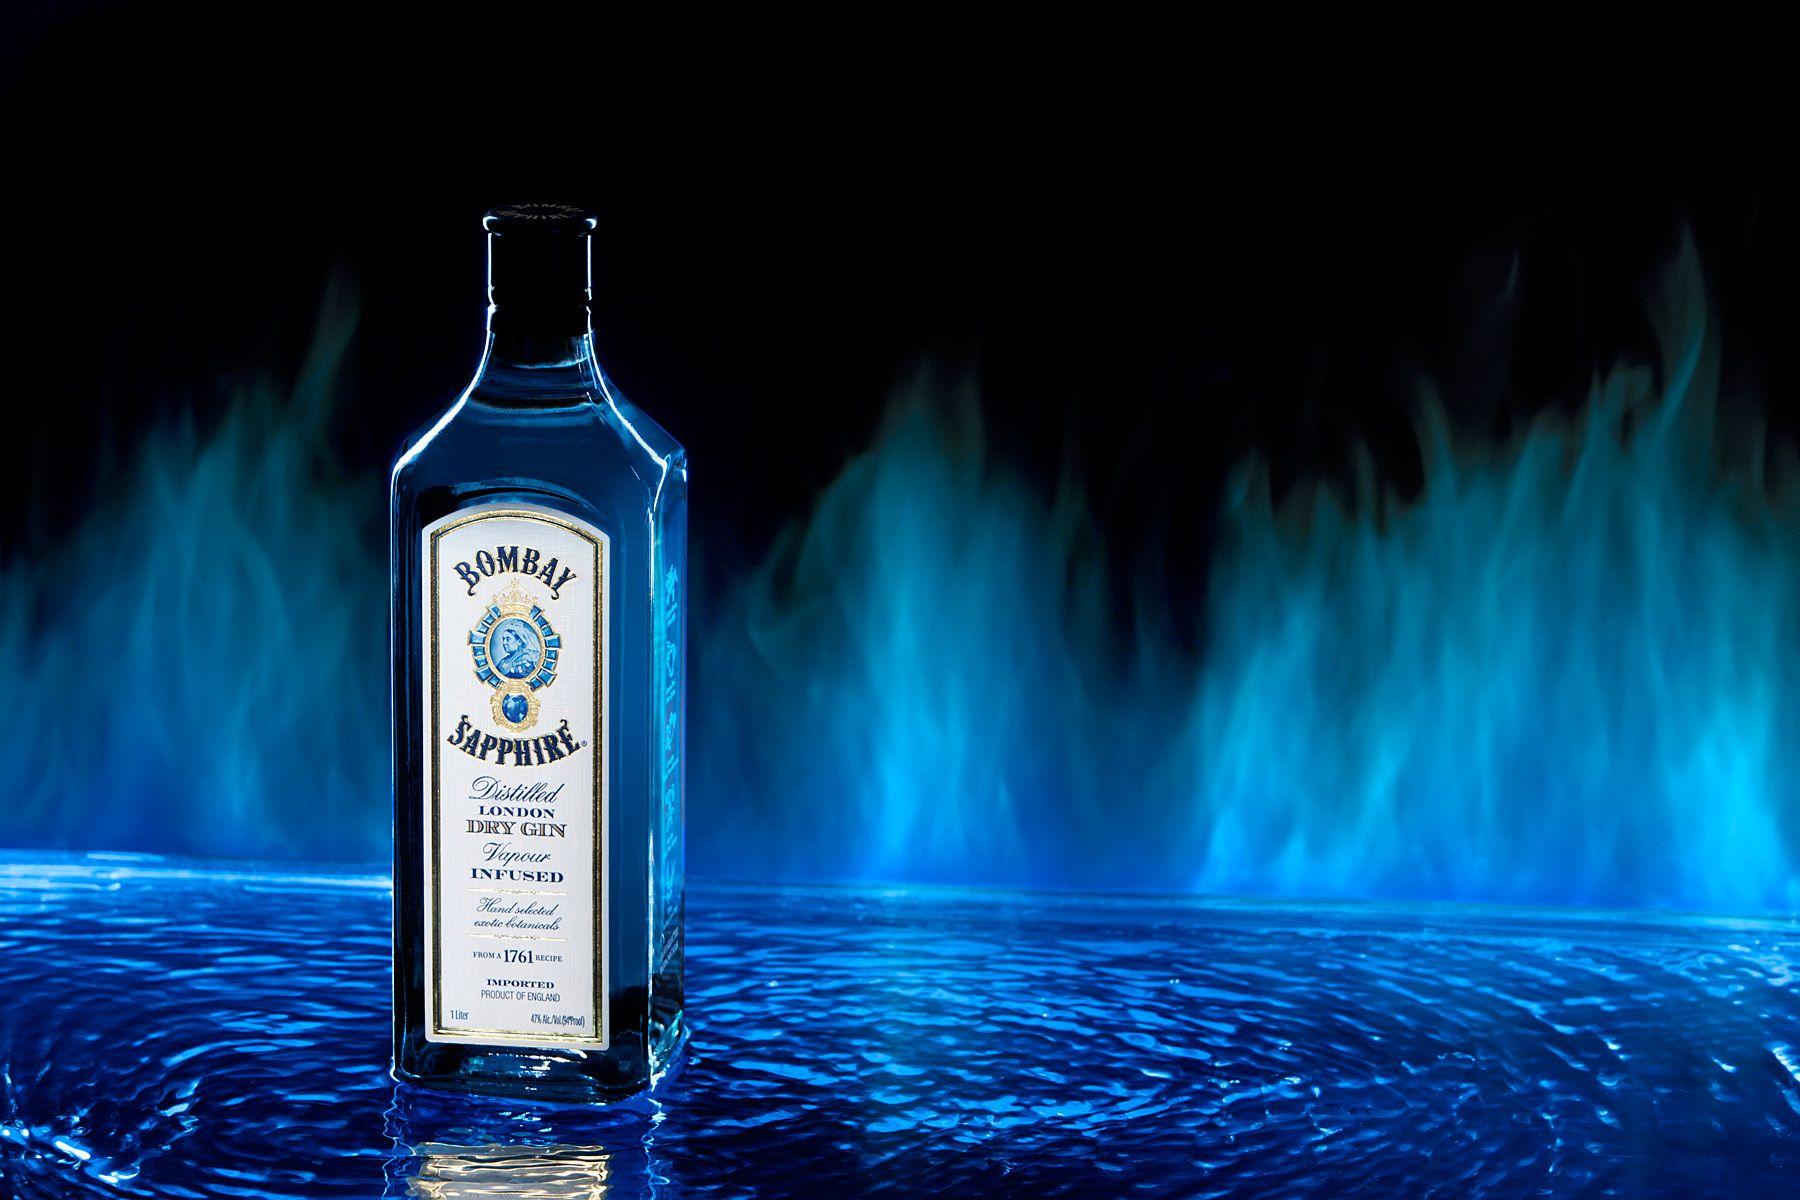 1brian_demello_photography_advertising_product_food_liquids_beverage_portrait_beauty_0397_bs_028_copy.jpg